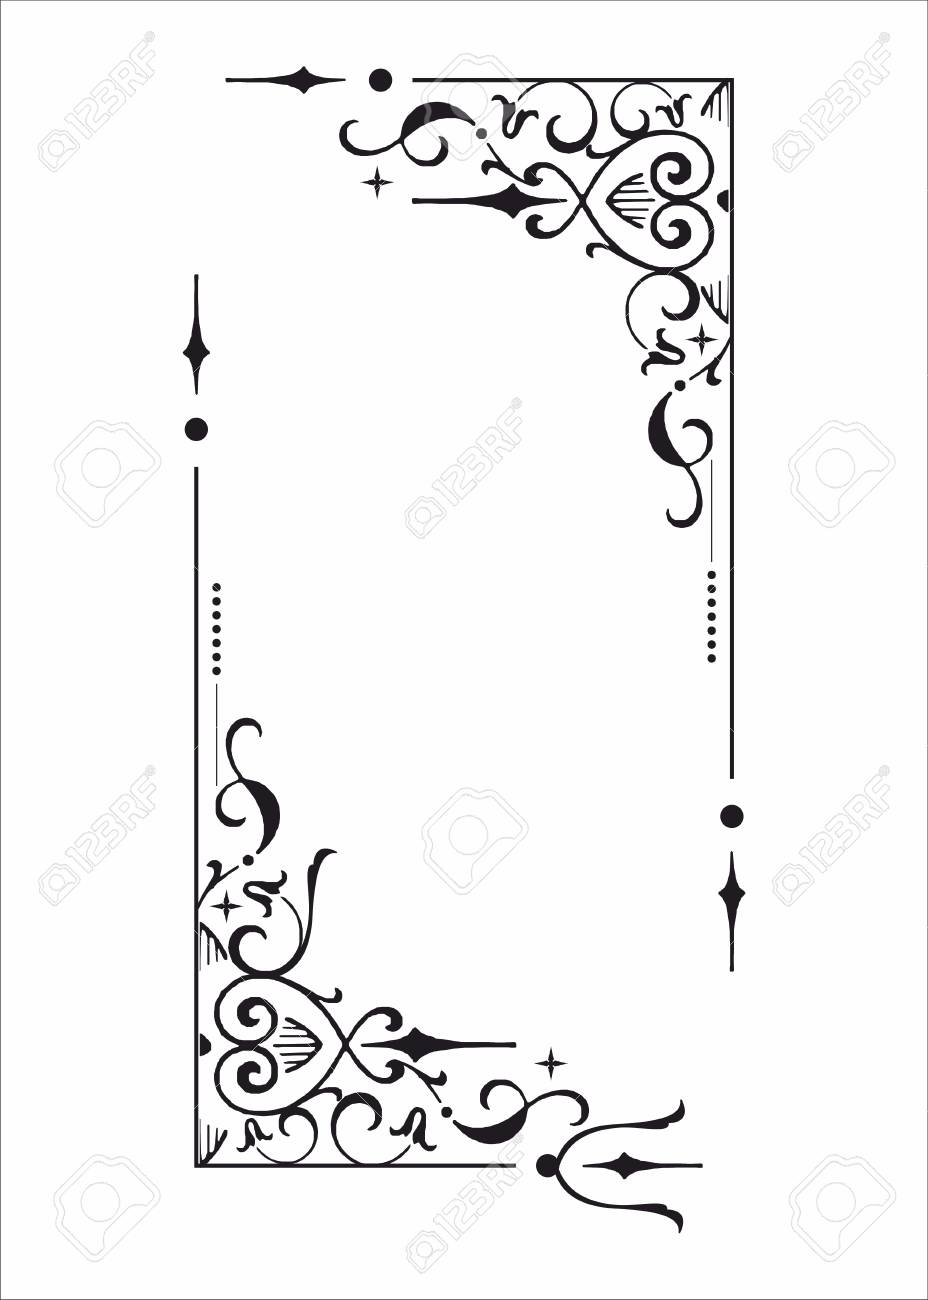 Decorative corner and frame element - 54773476